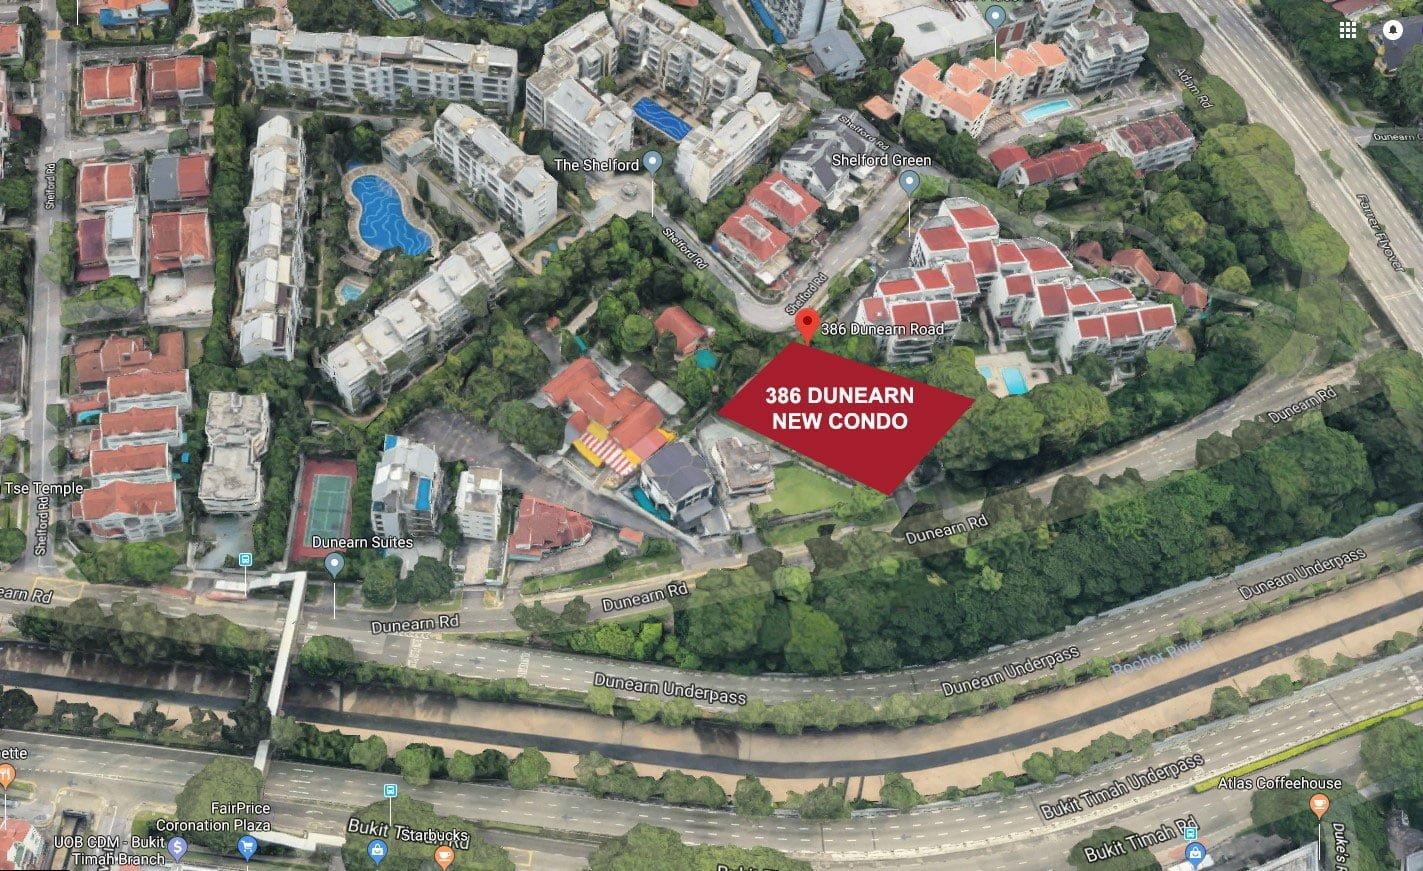 386-dunearn-new-condo-location-map-vZc700